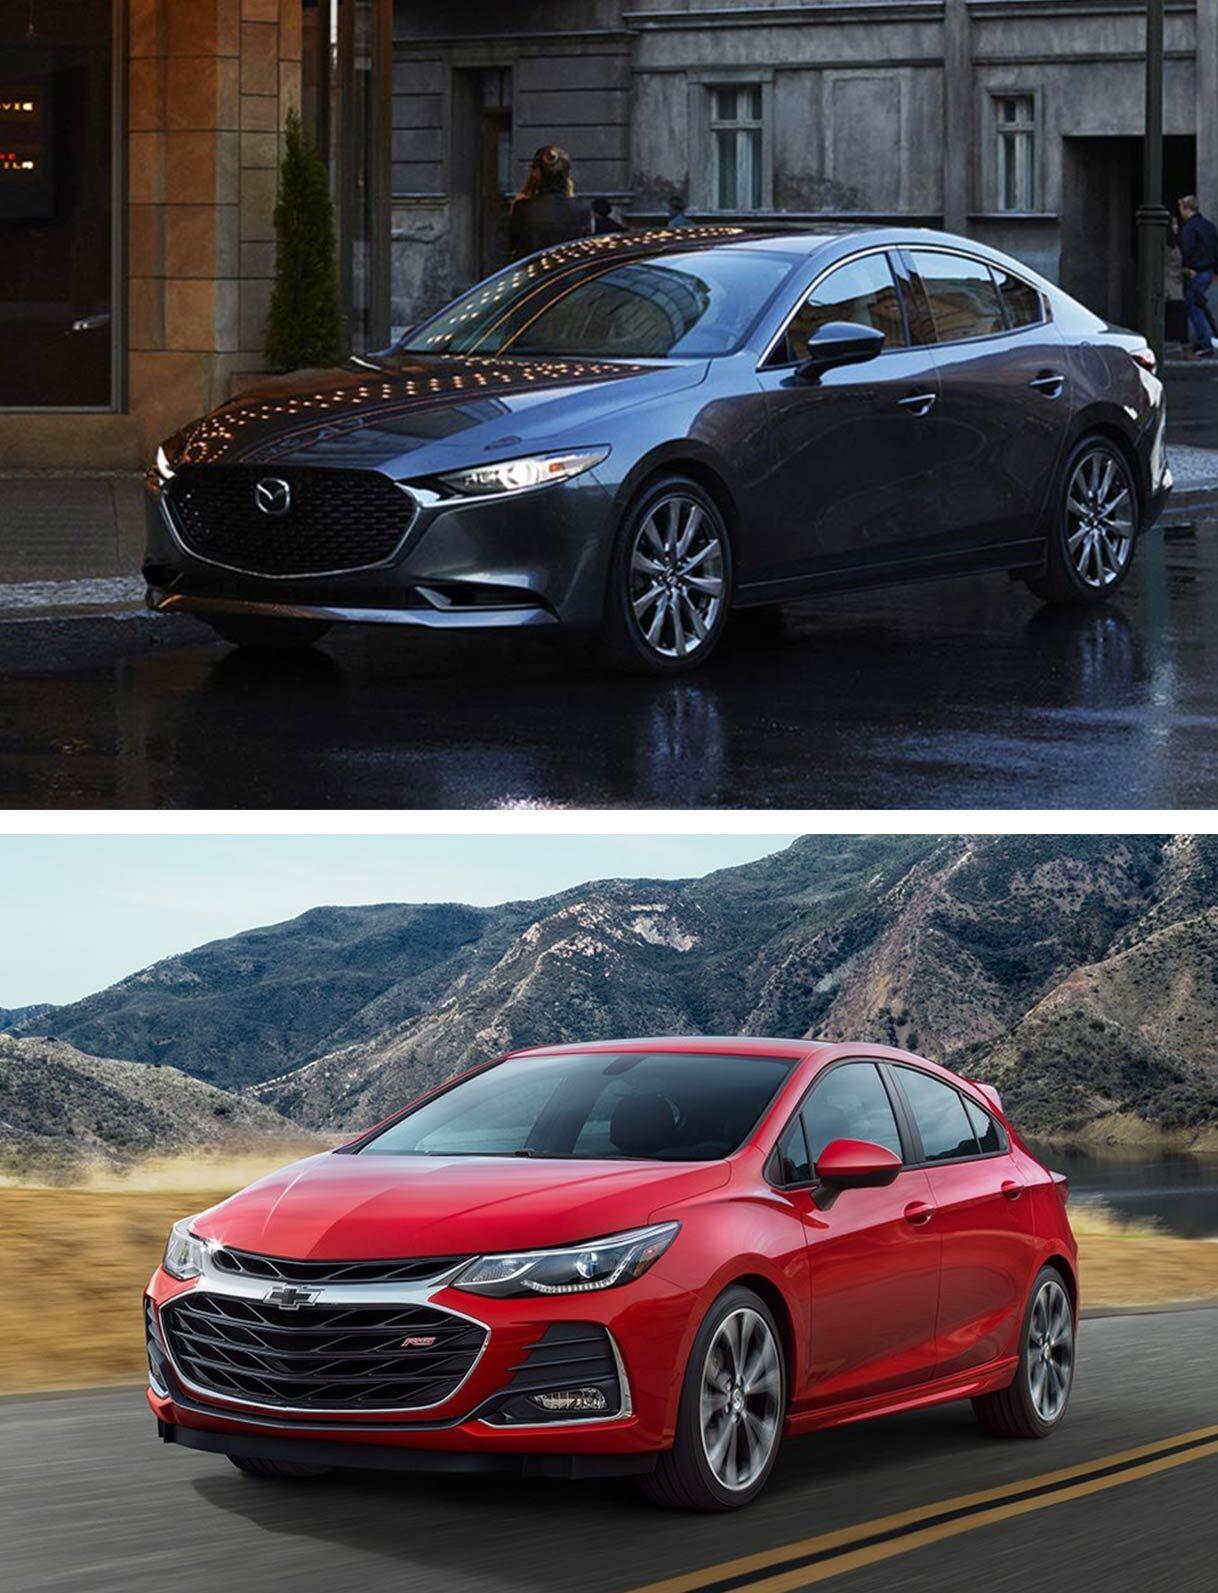 2019 Mazda 3 vs. 2019 Chevy Cruze